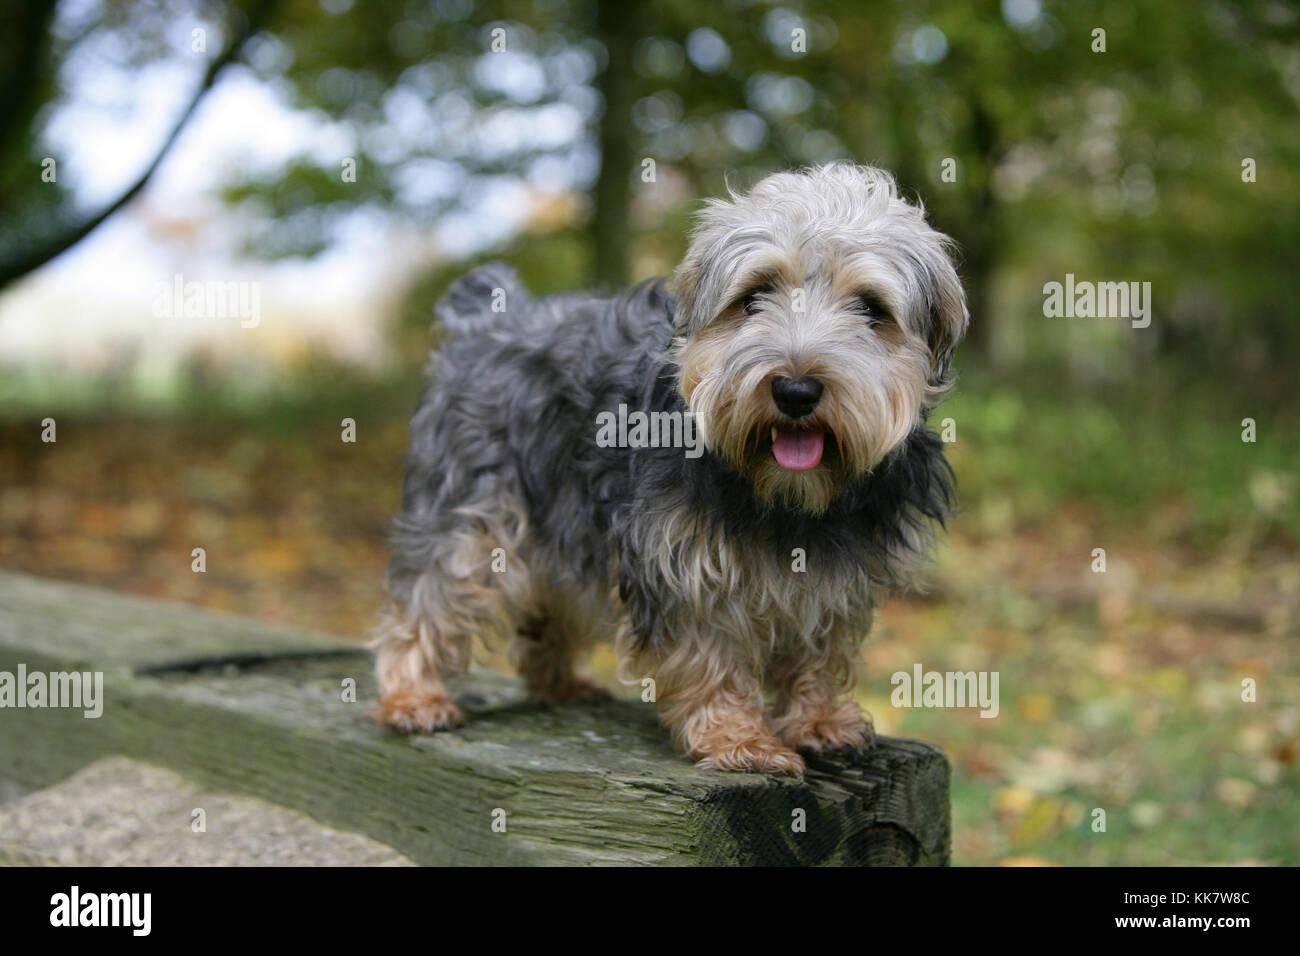 Terrier - Lucas Lucas Terrier Standing - Stock Image